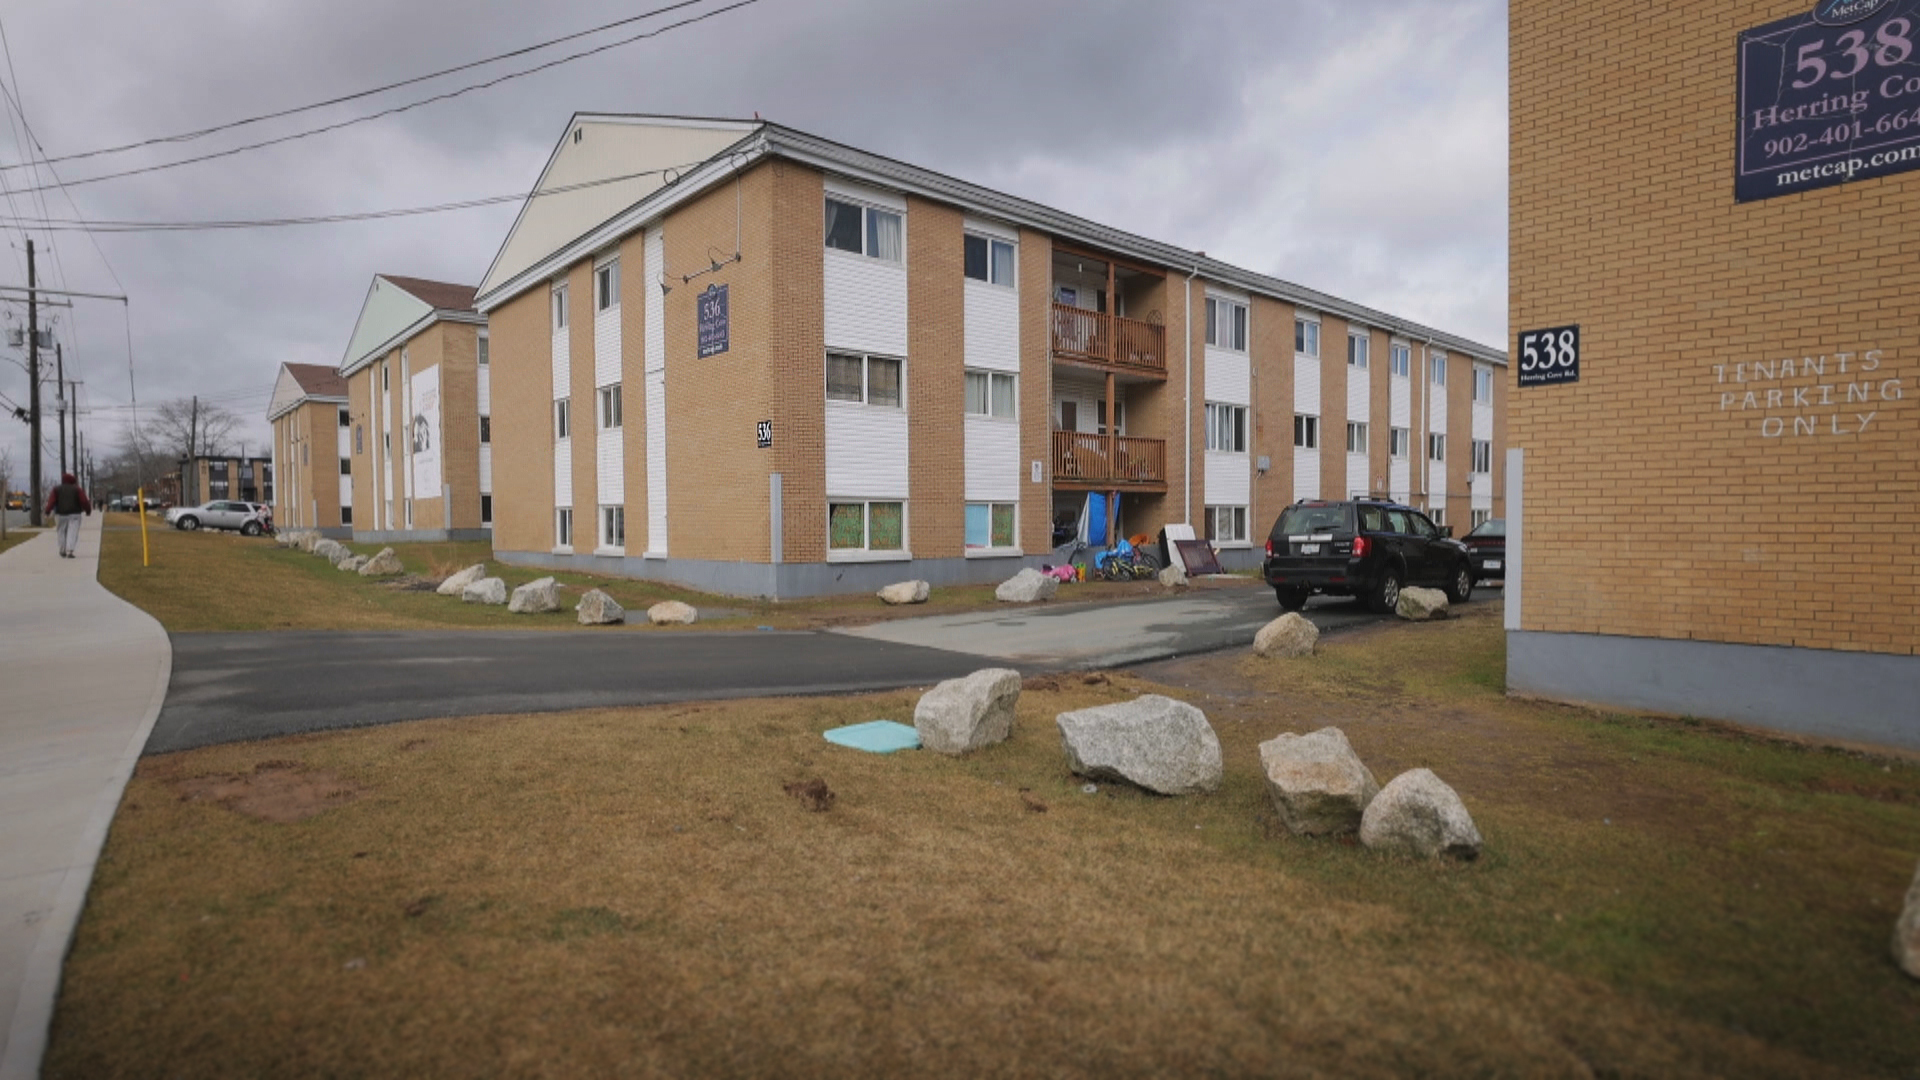 The 500 block of Herring Cove Road in Spryfield. (Robert Short/CBC)